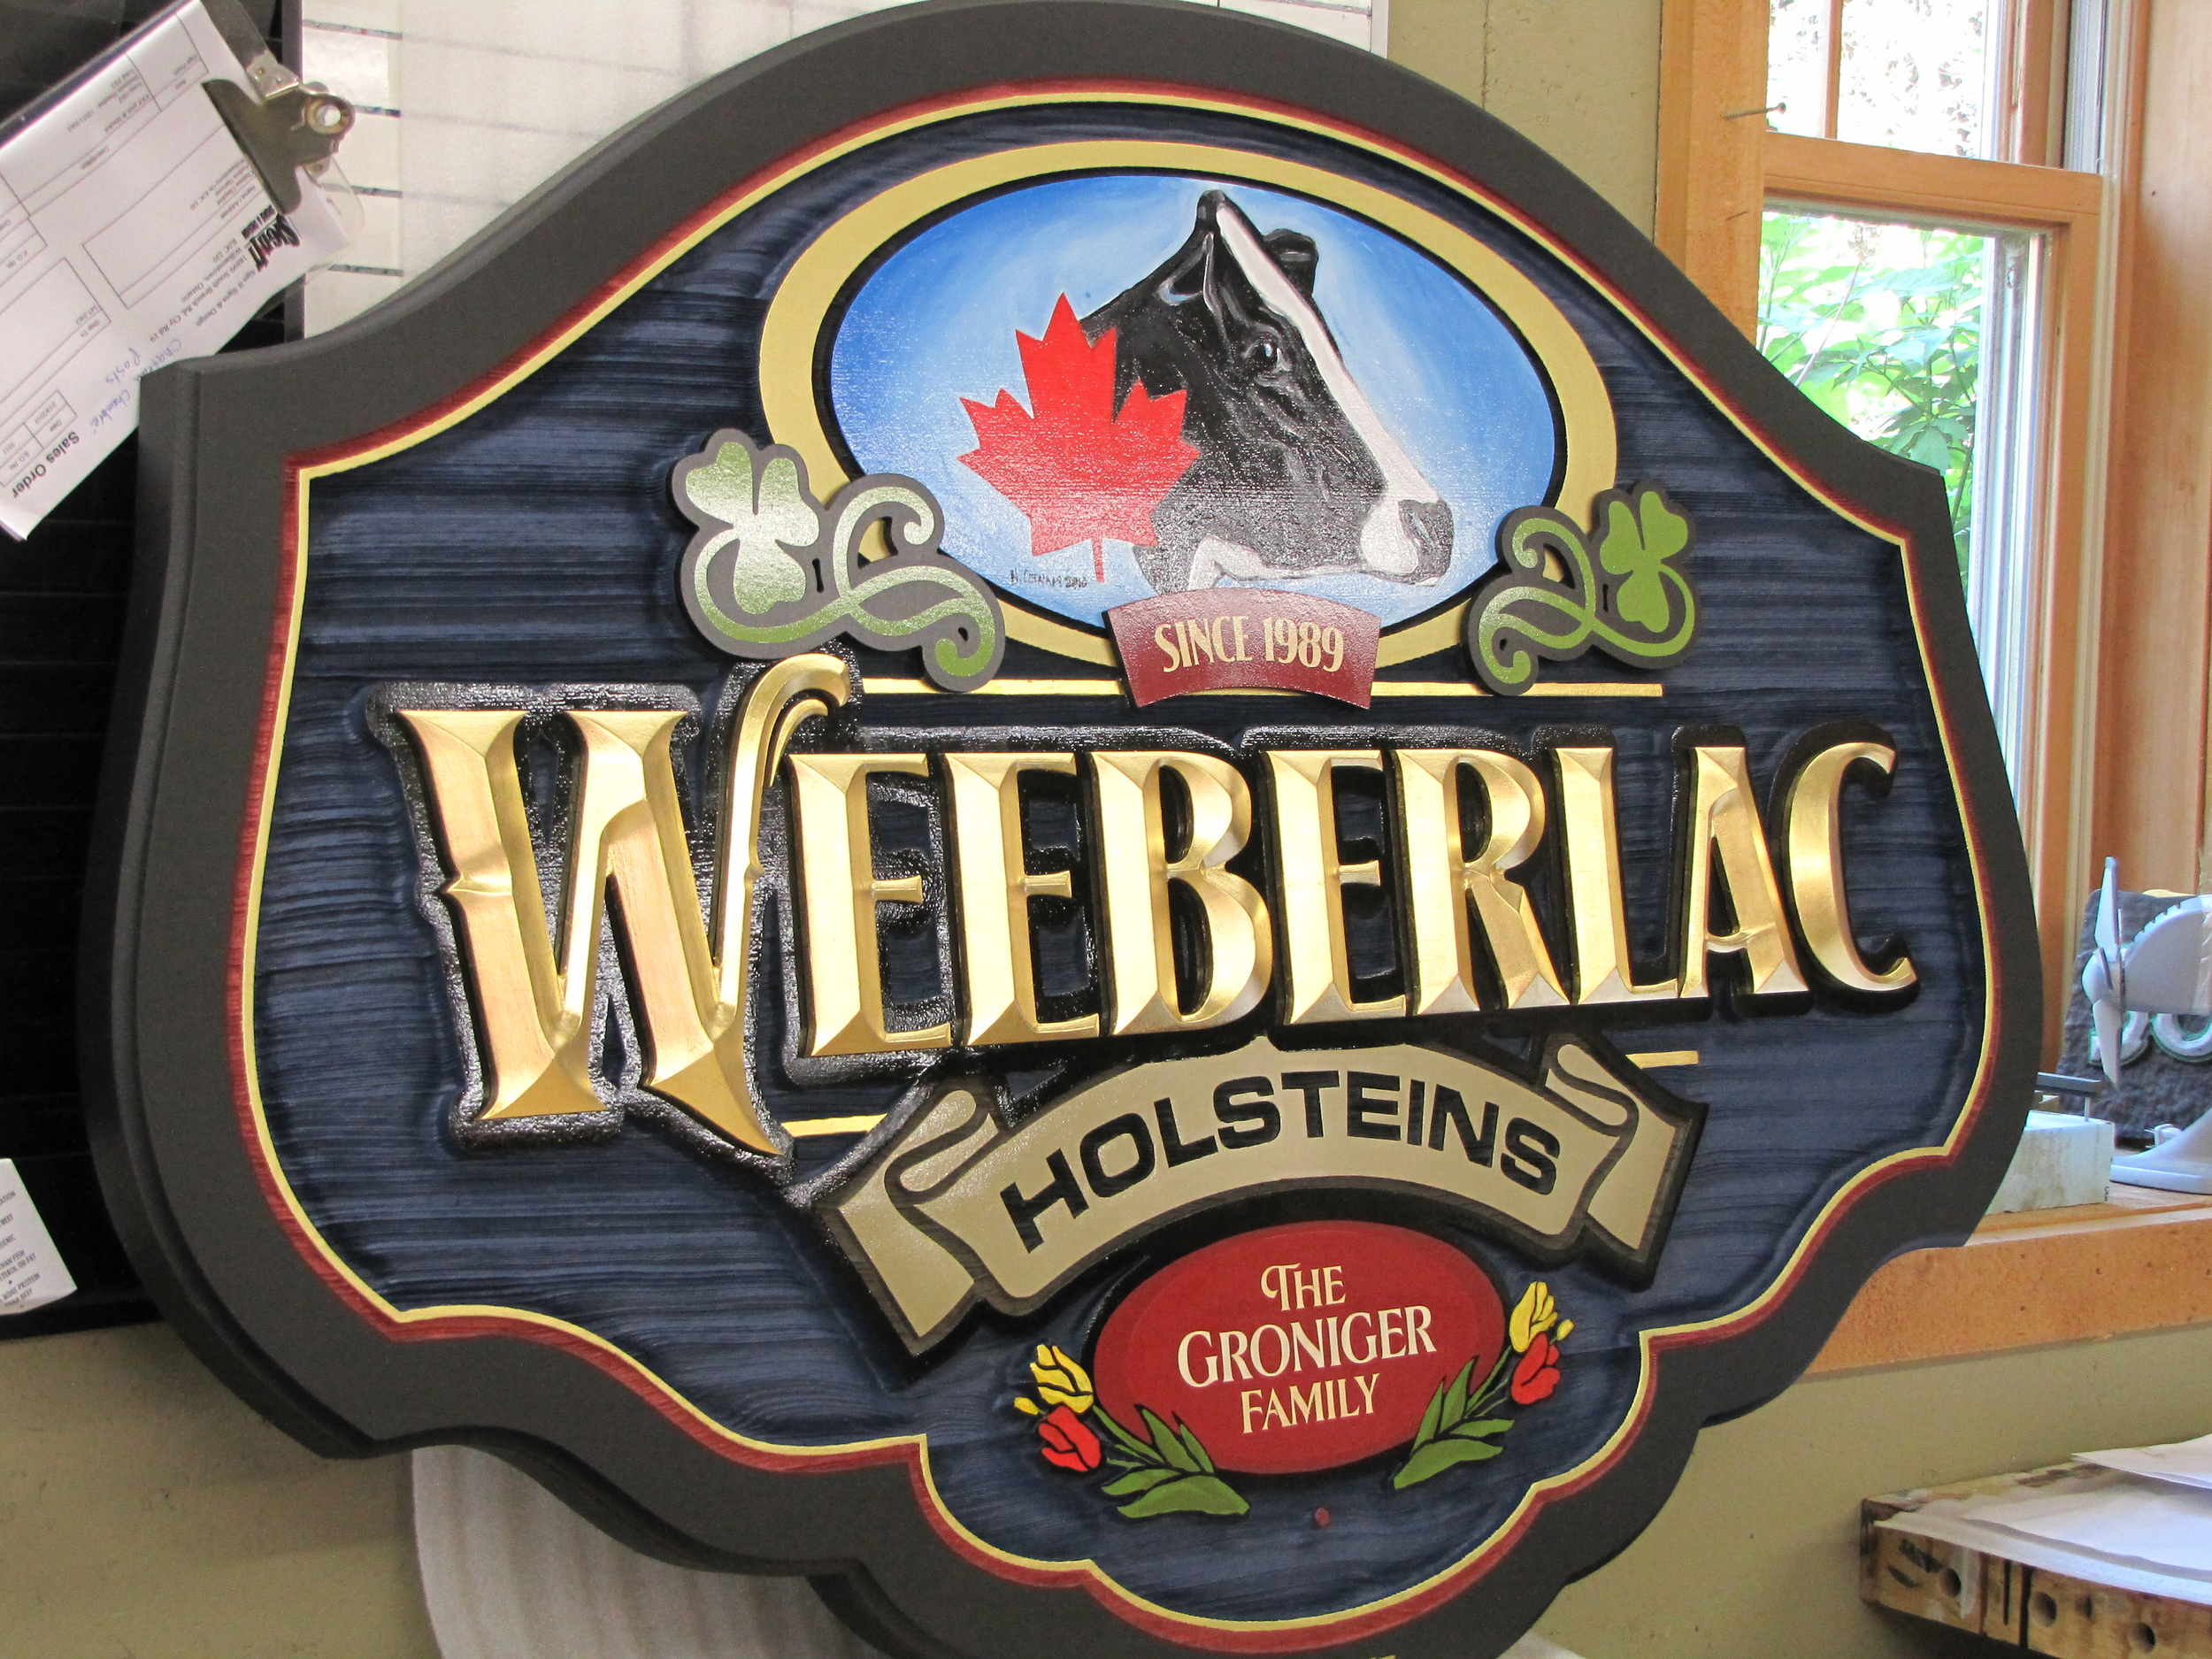 Weeberlac.JPG